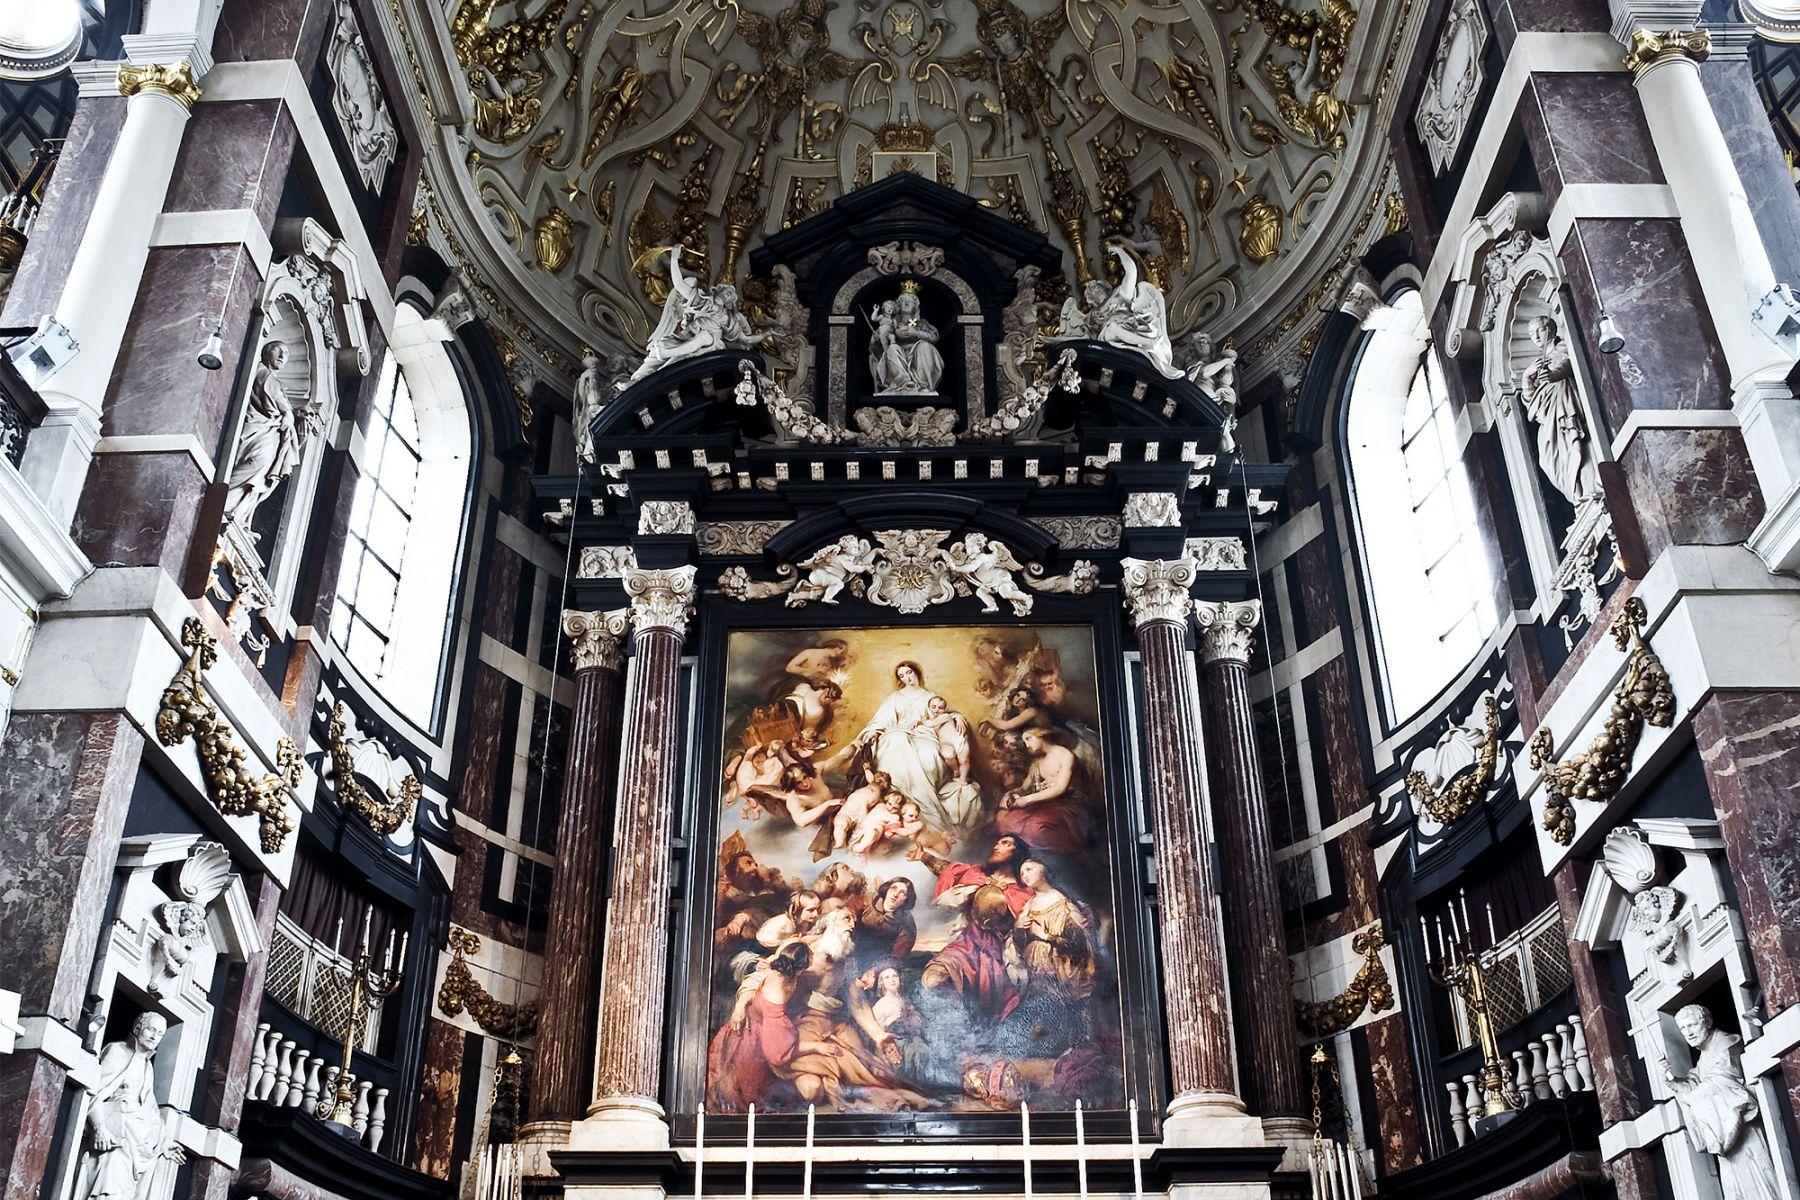 De prachtige Sint Carolus Borromeuskerk in antwerpen